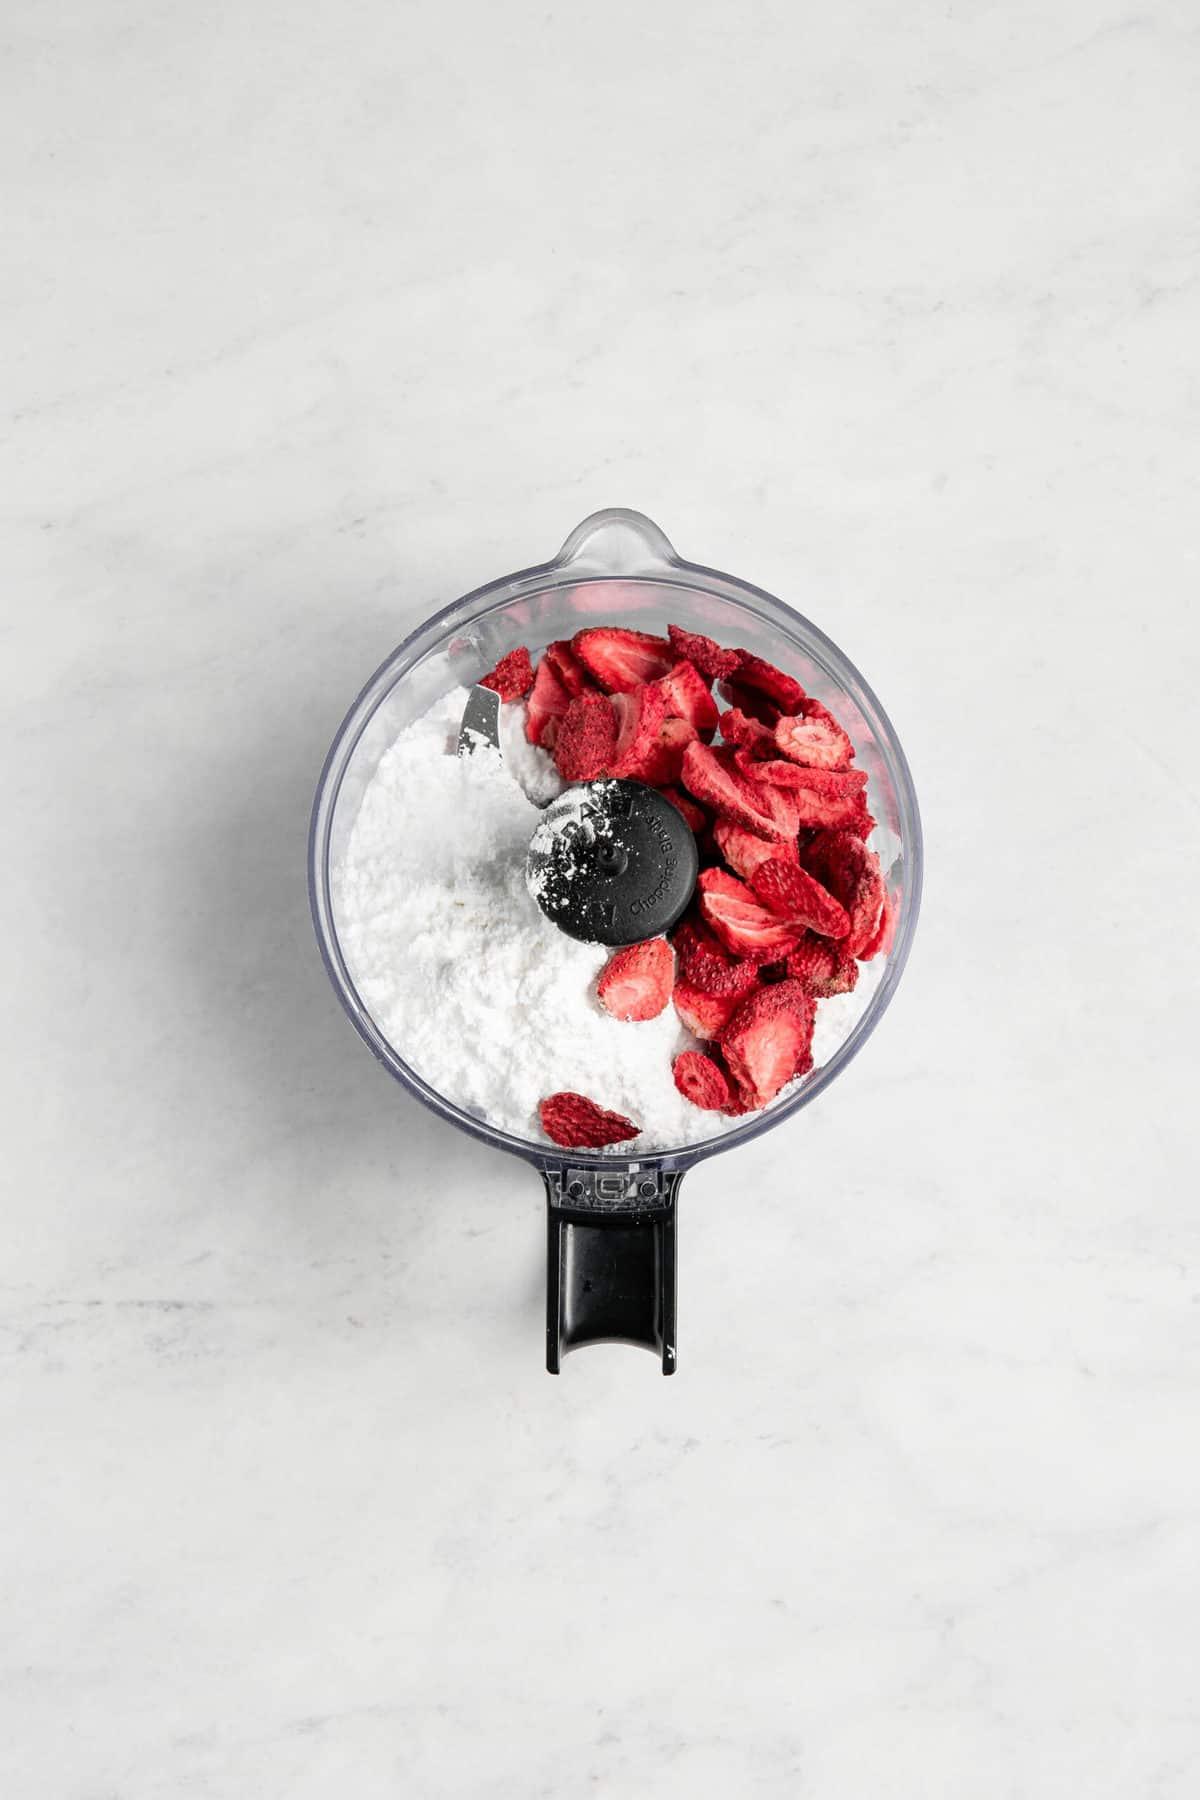 Freeze Dried Strawberries in food processor.